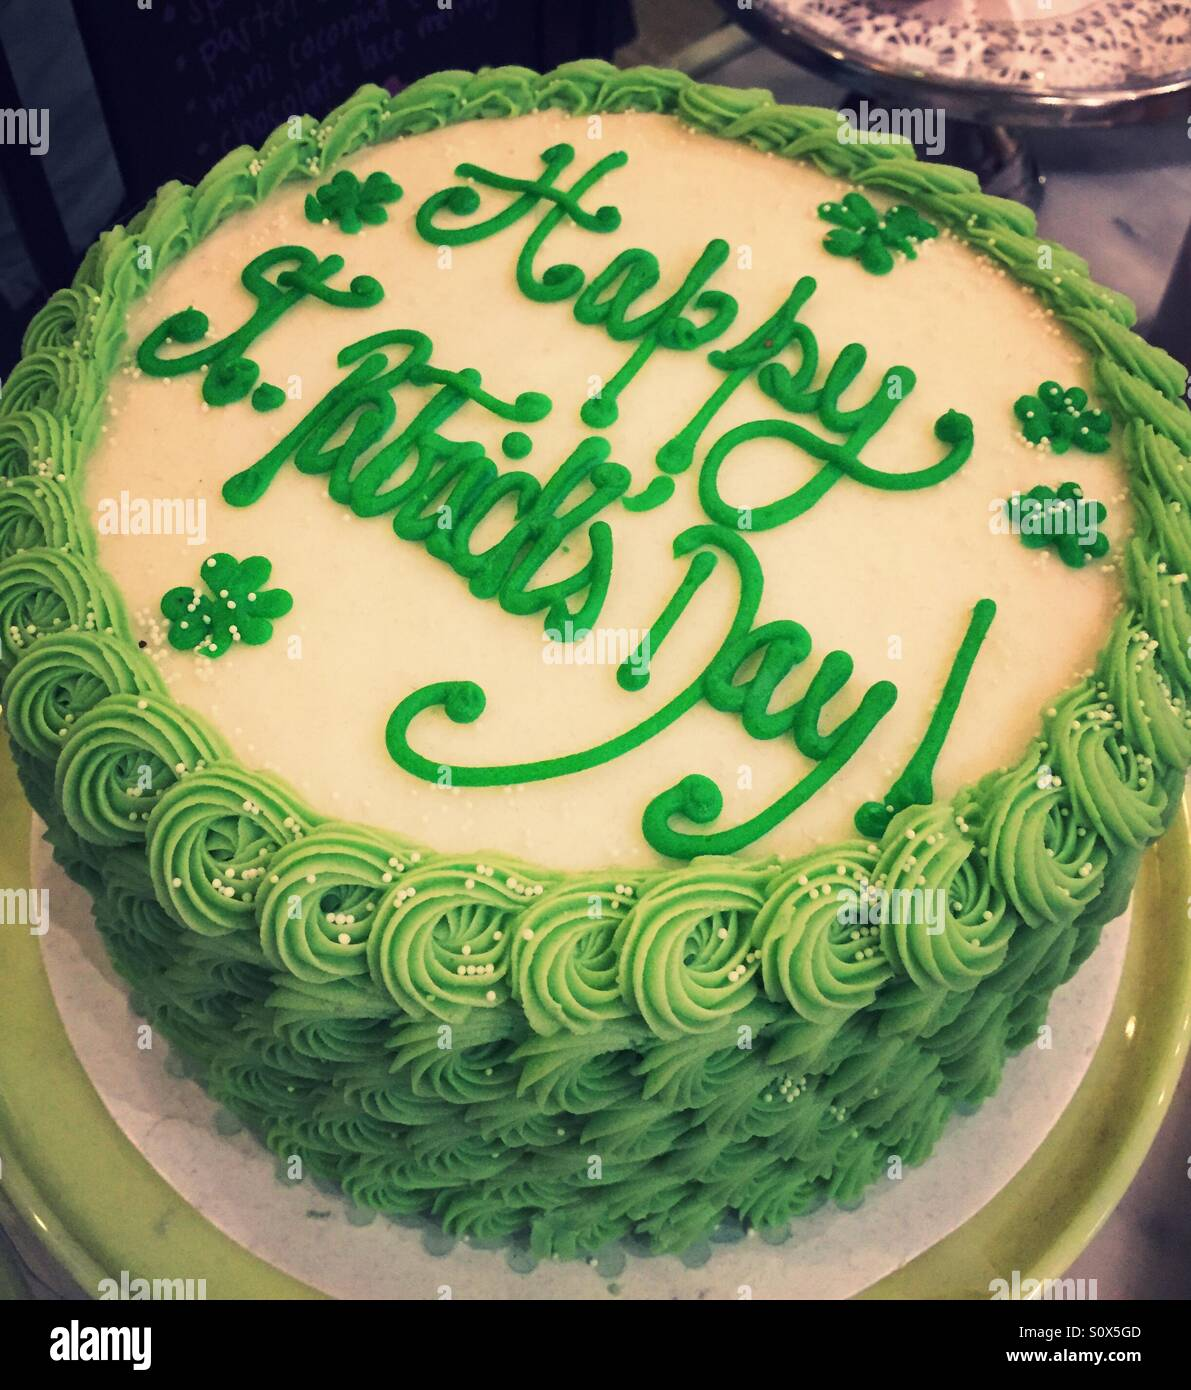 Happy St Patrick S Day Cake Stock Photo Alamy